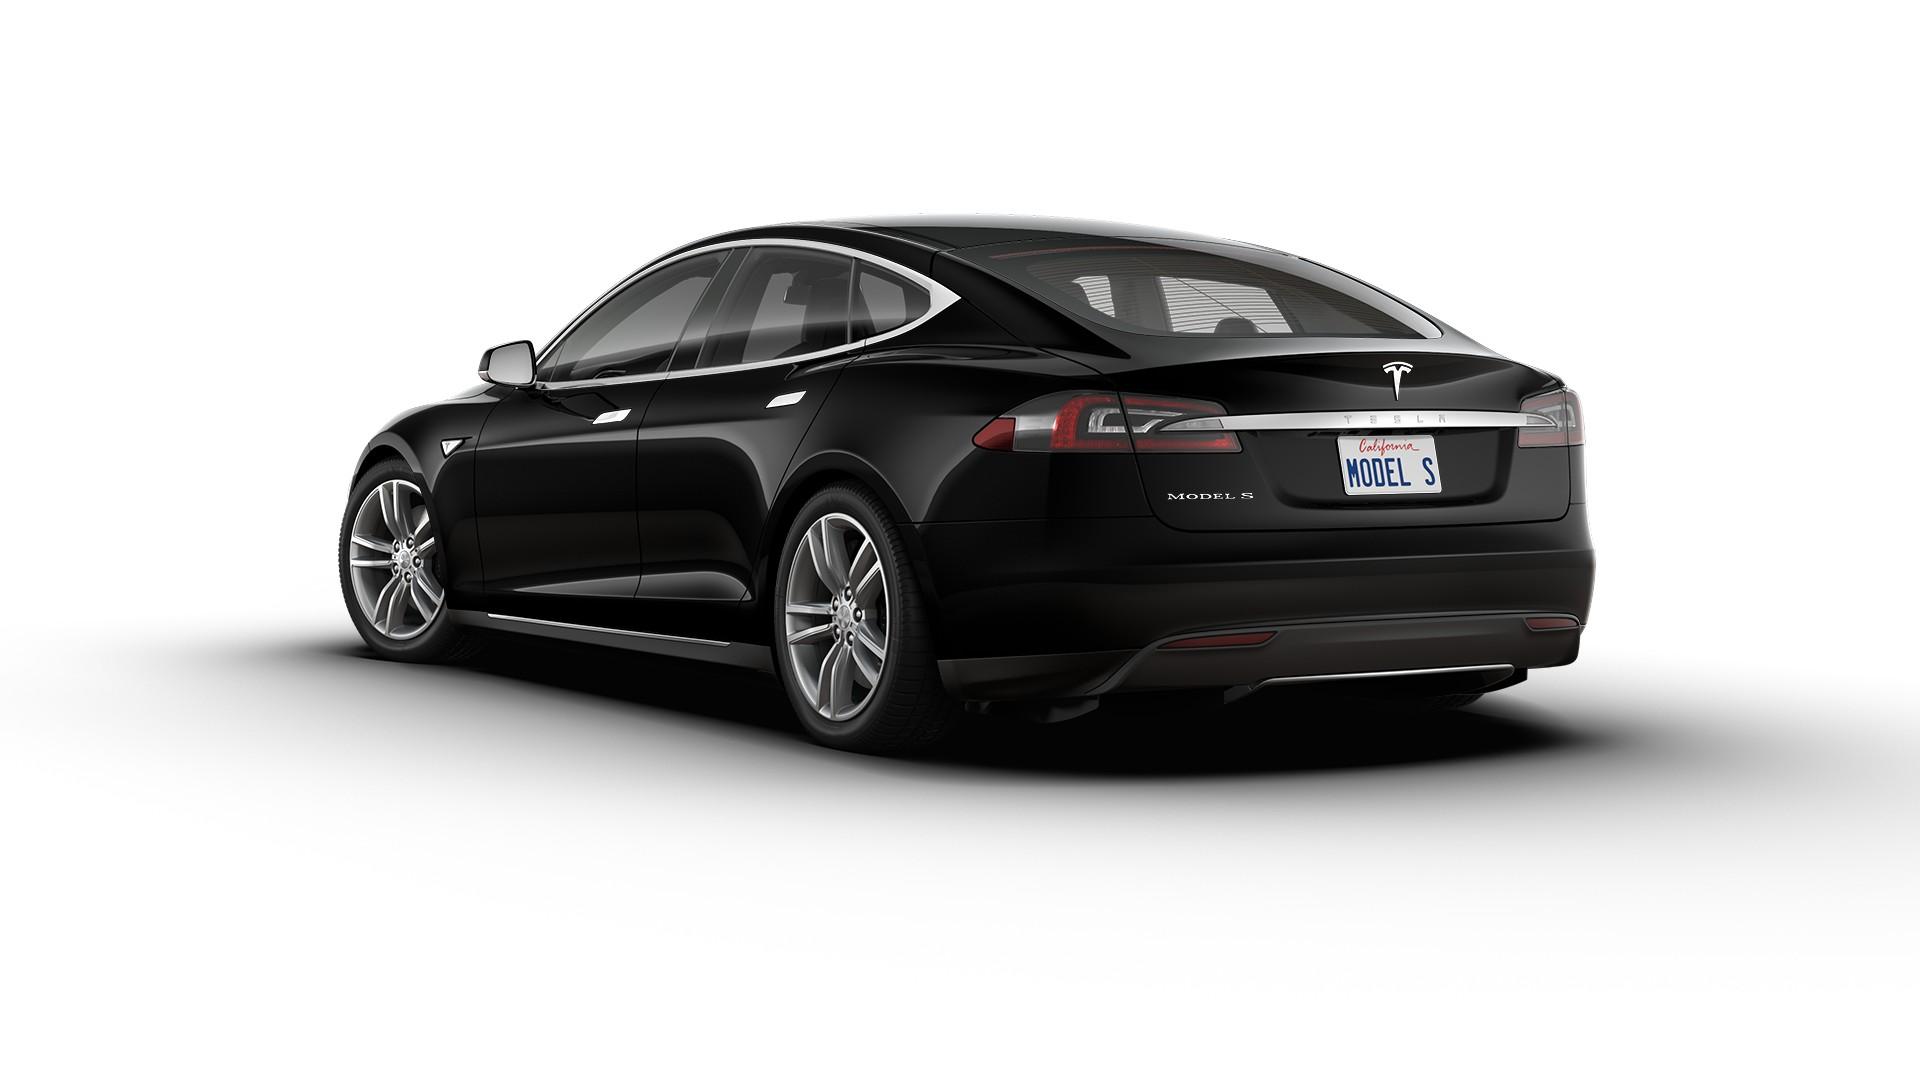 "Exterieur 19"" Wheels Solid Black Panoramic Crystal Roof"